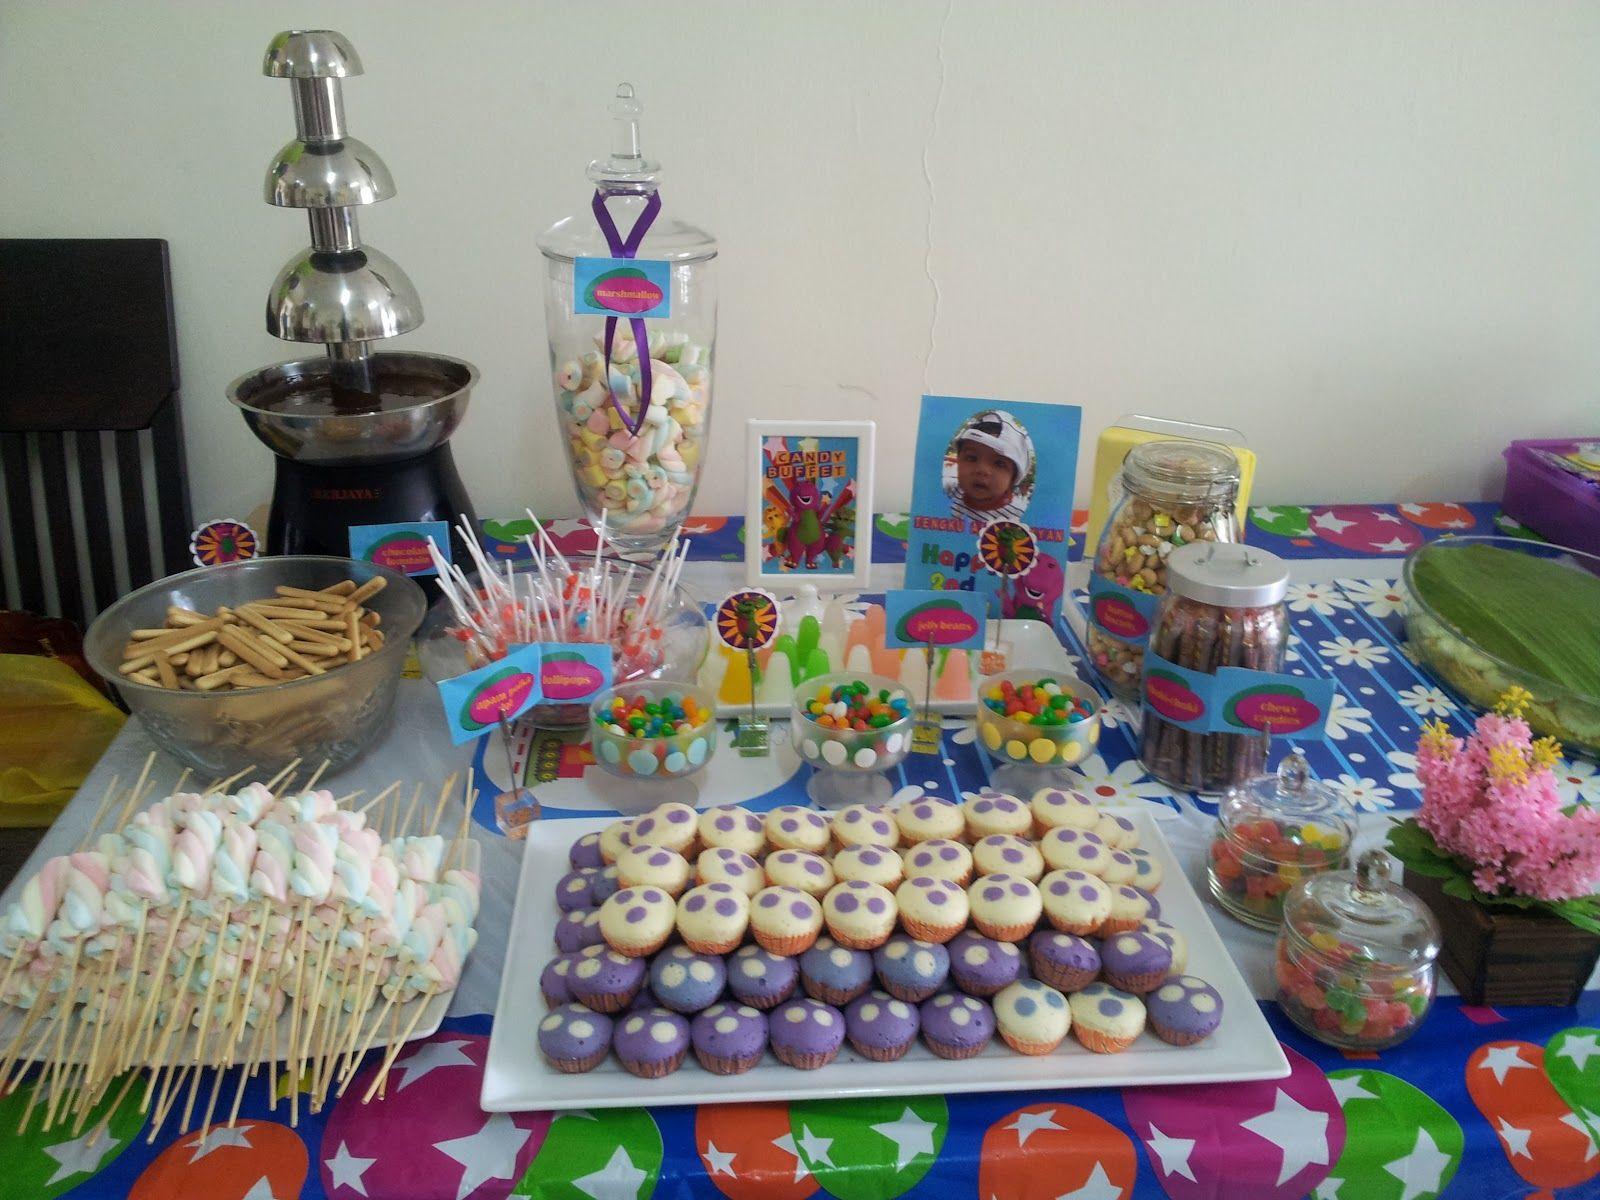 barney supplies birthday celebrations birthday party ideas 2015